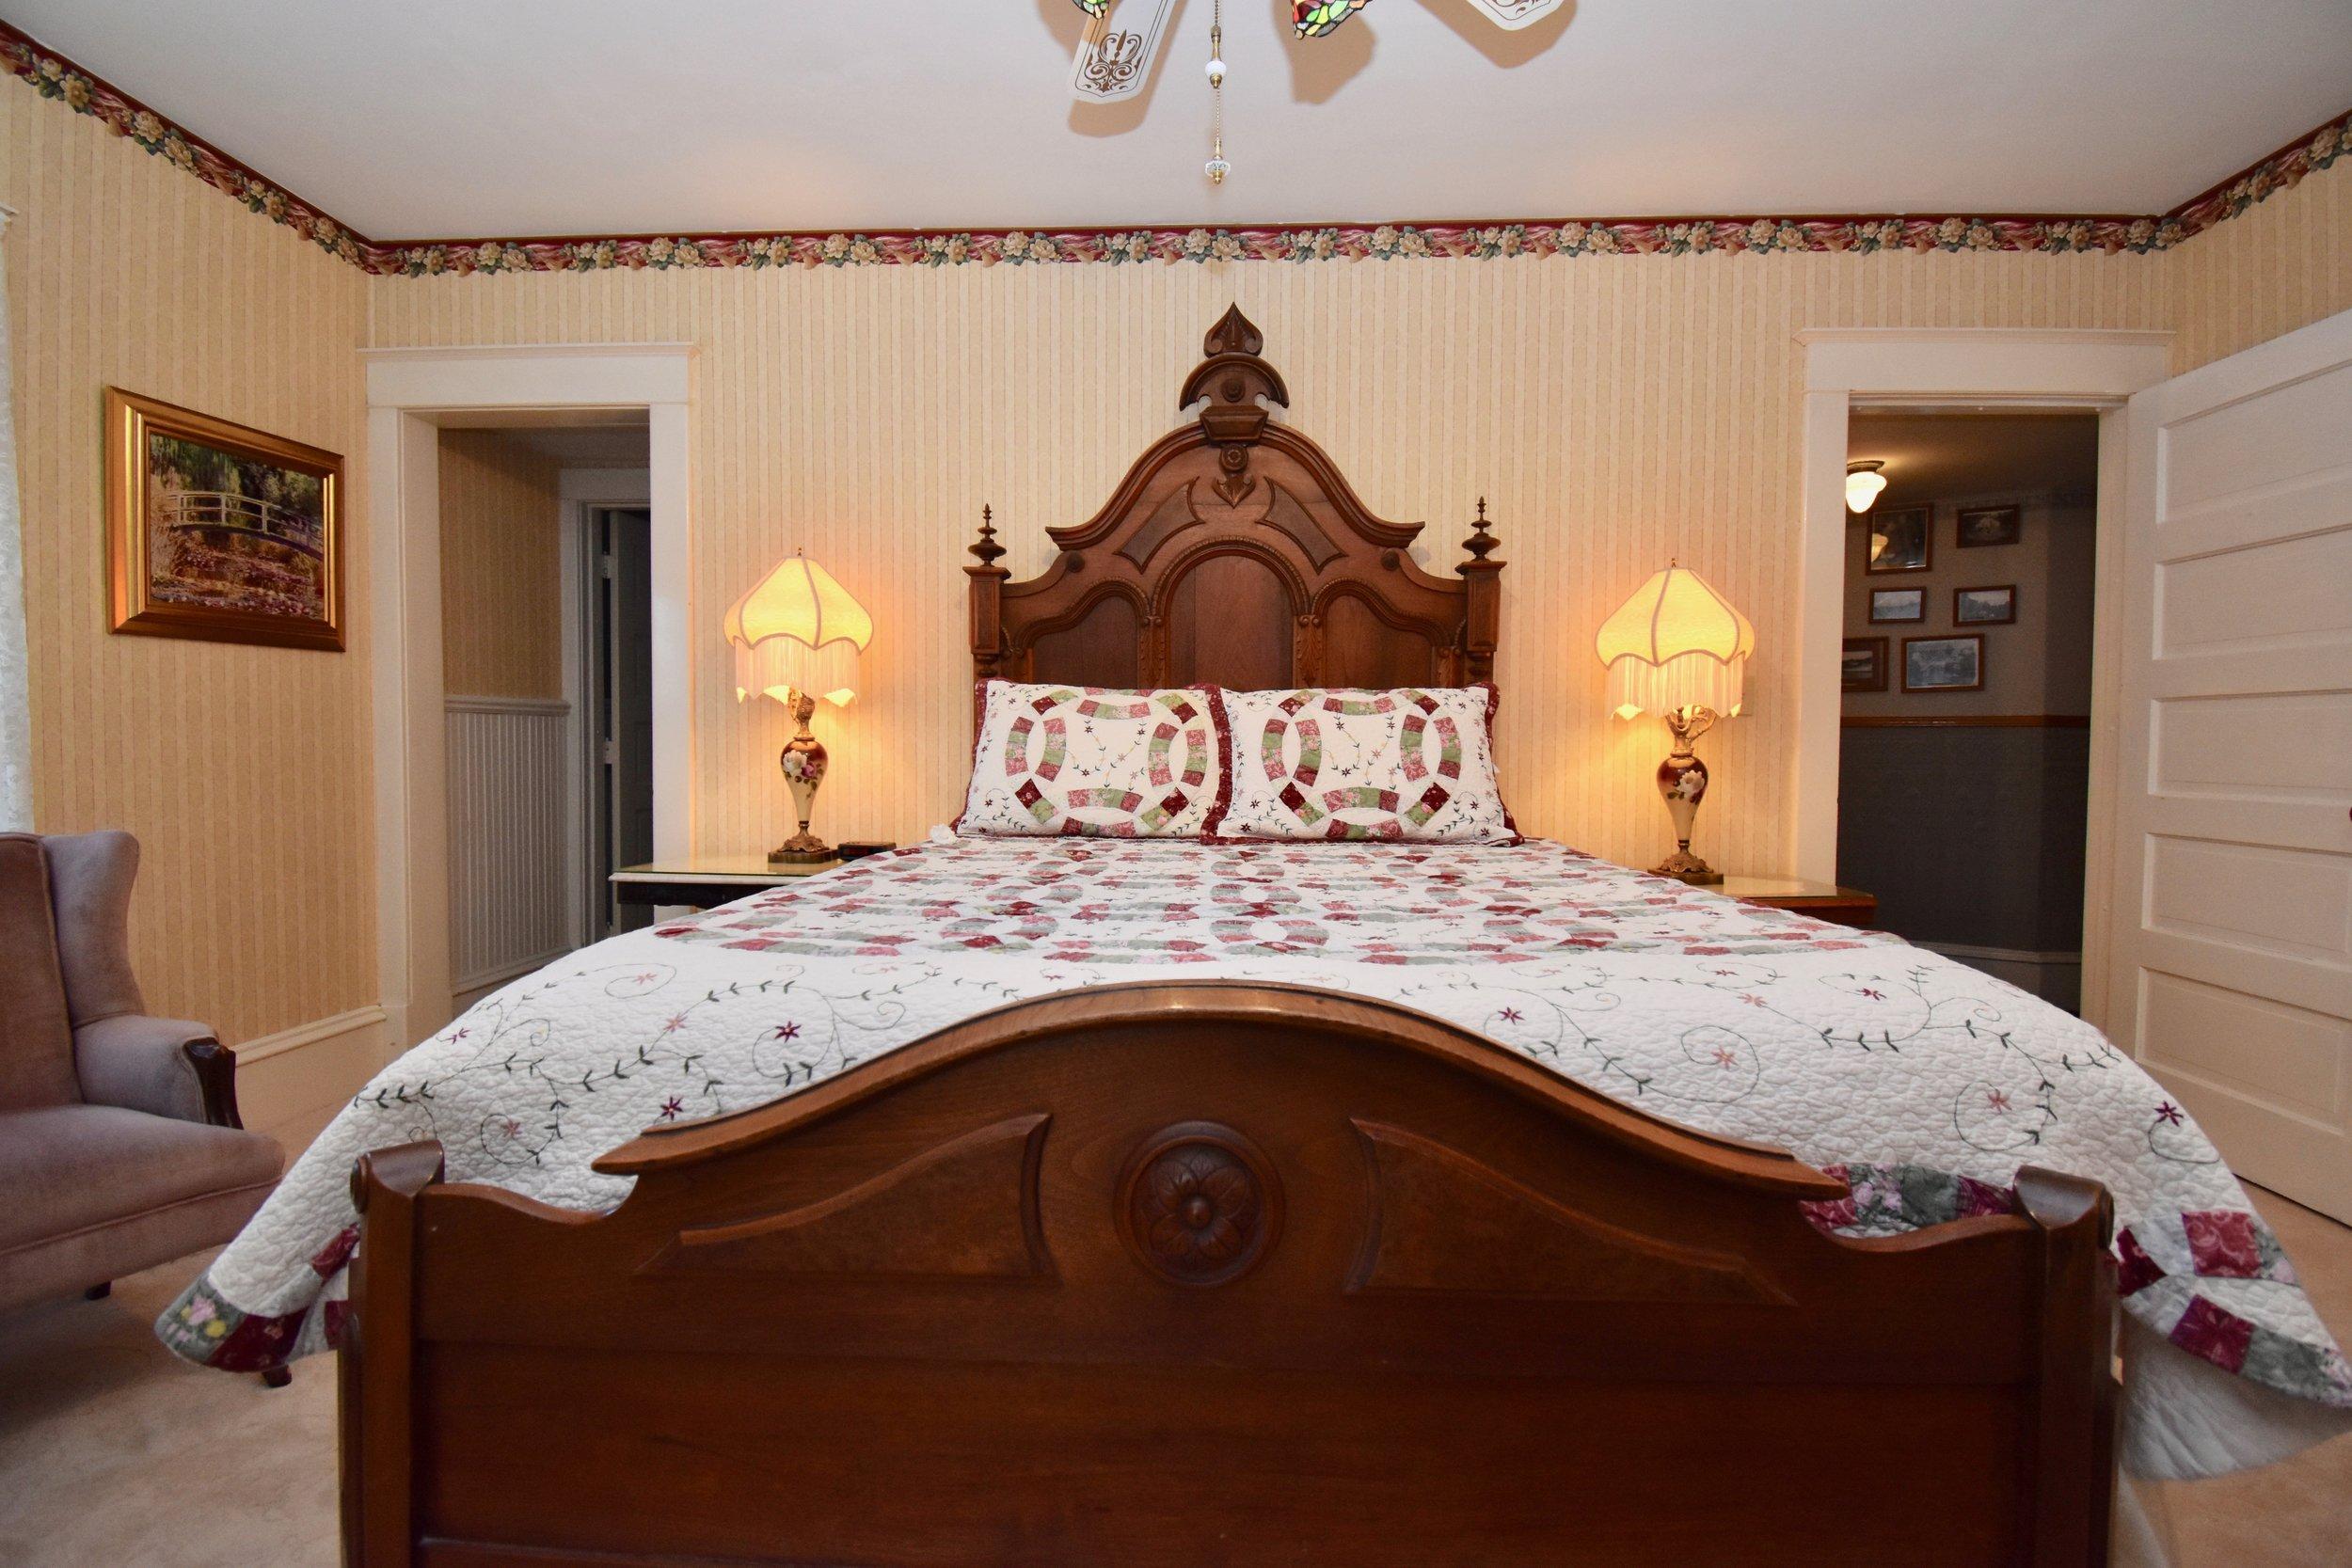 Eastlake Bed